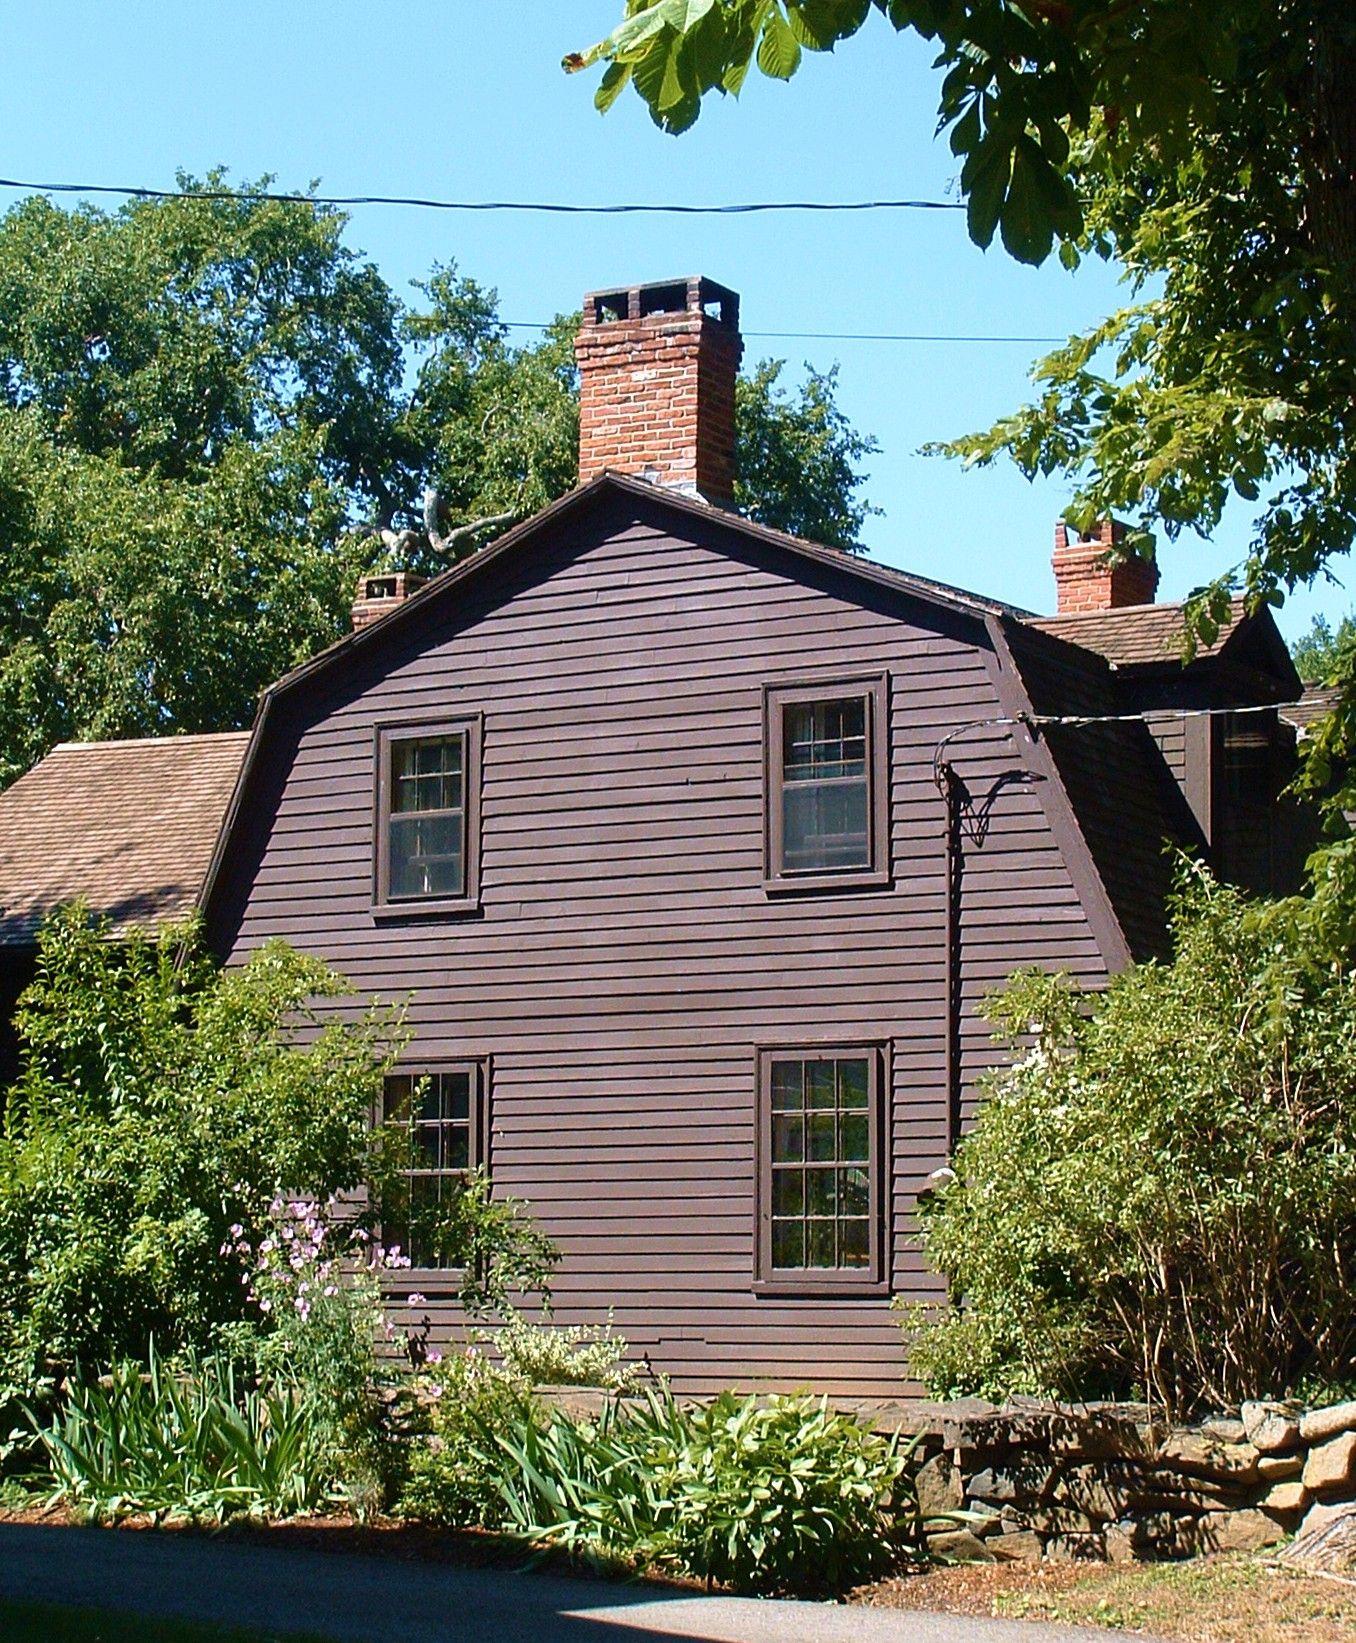 the oldest surviving house in annapolis royal nova scotia is the rh pinterest com